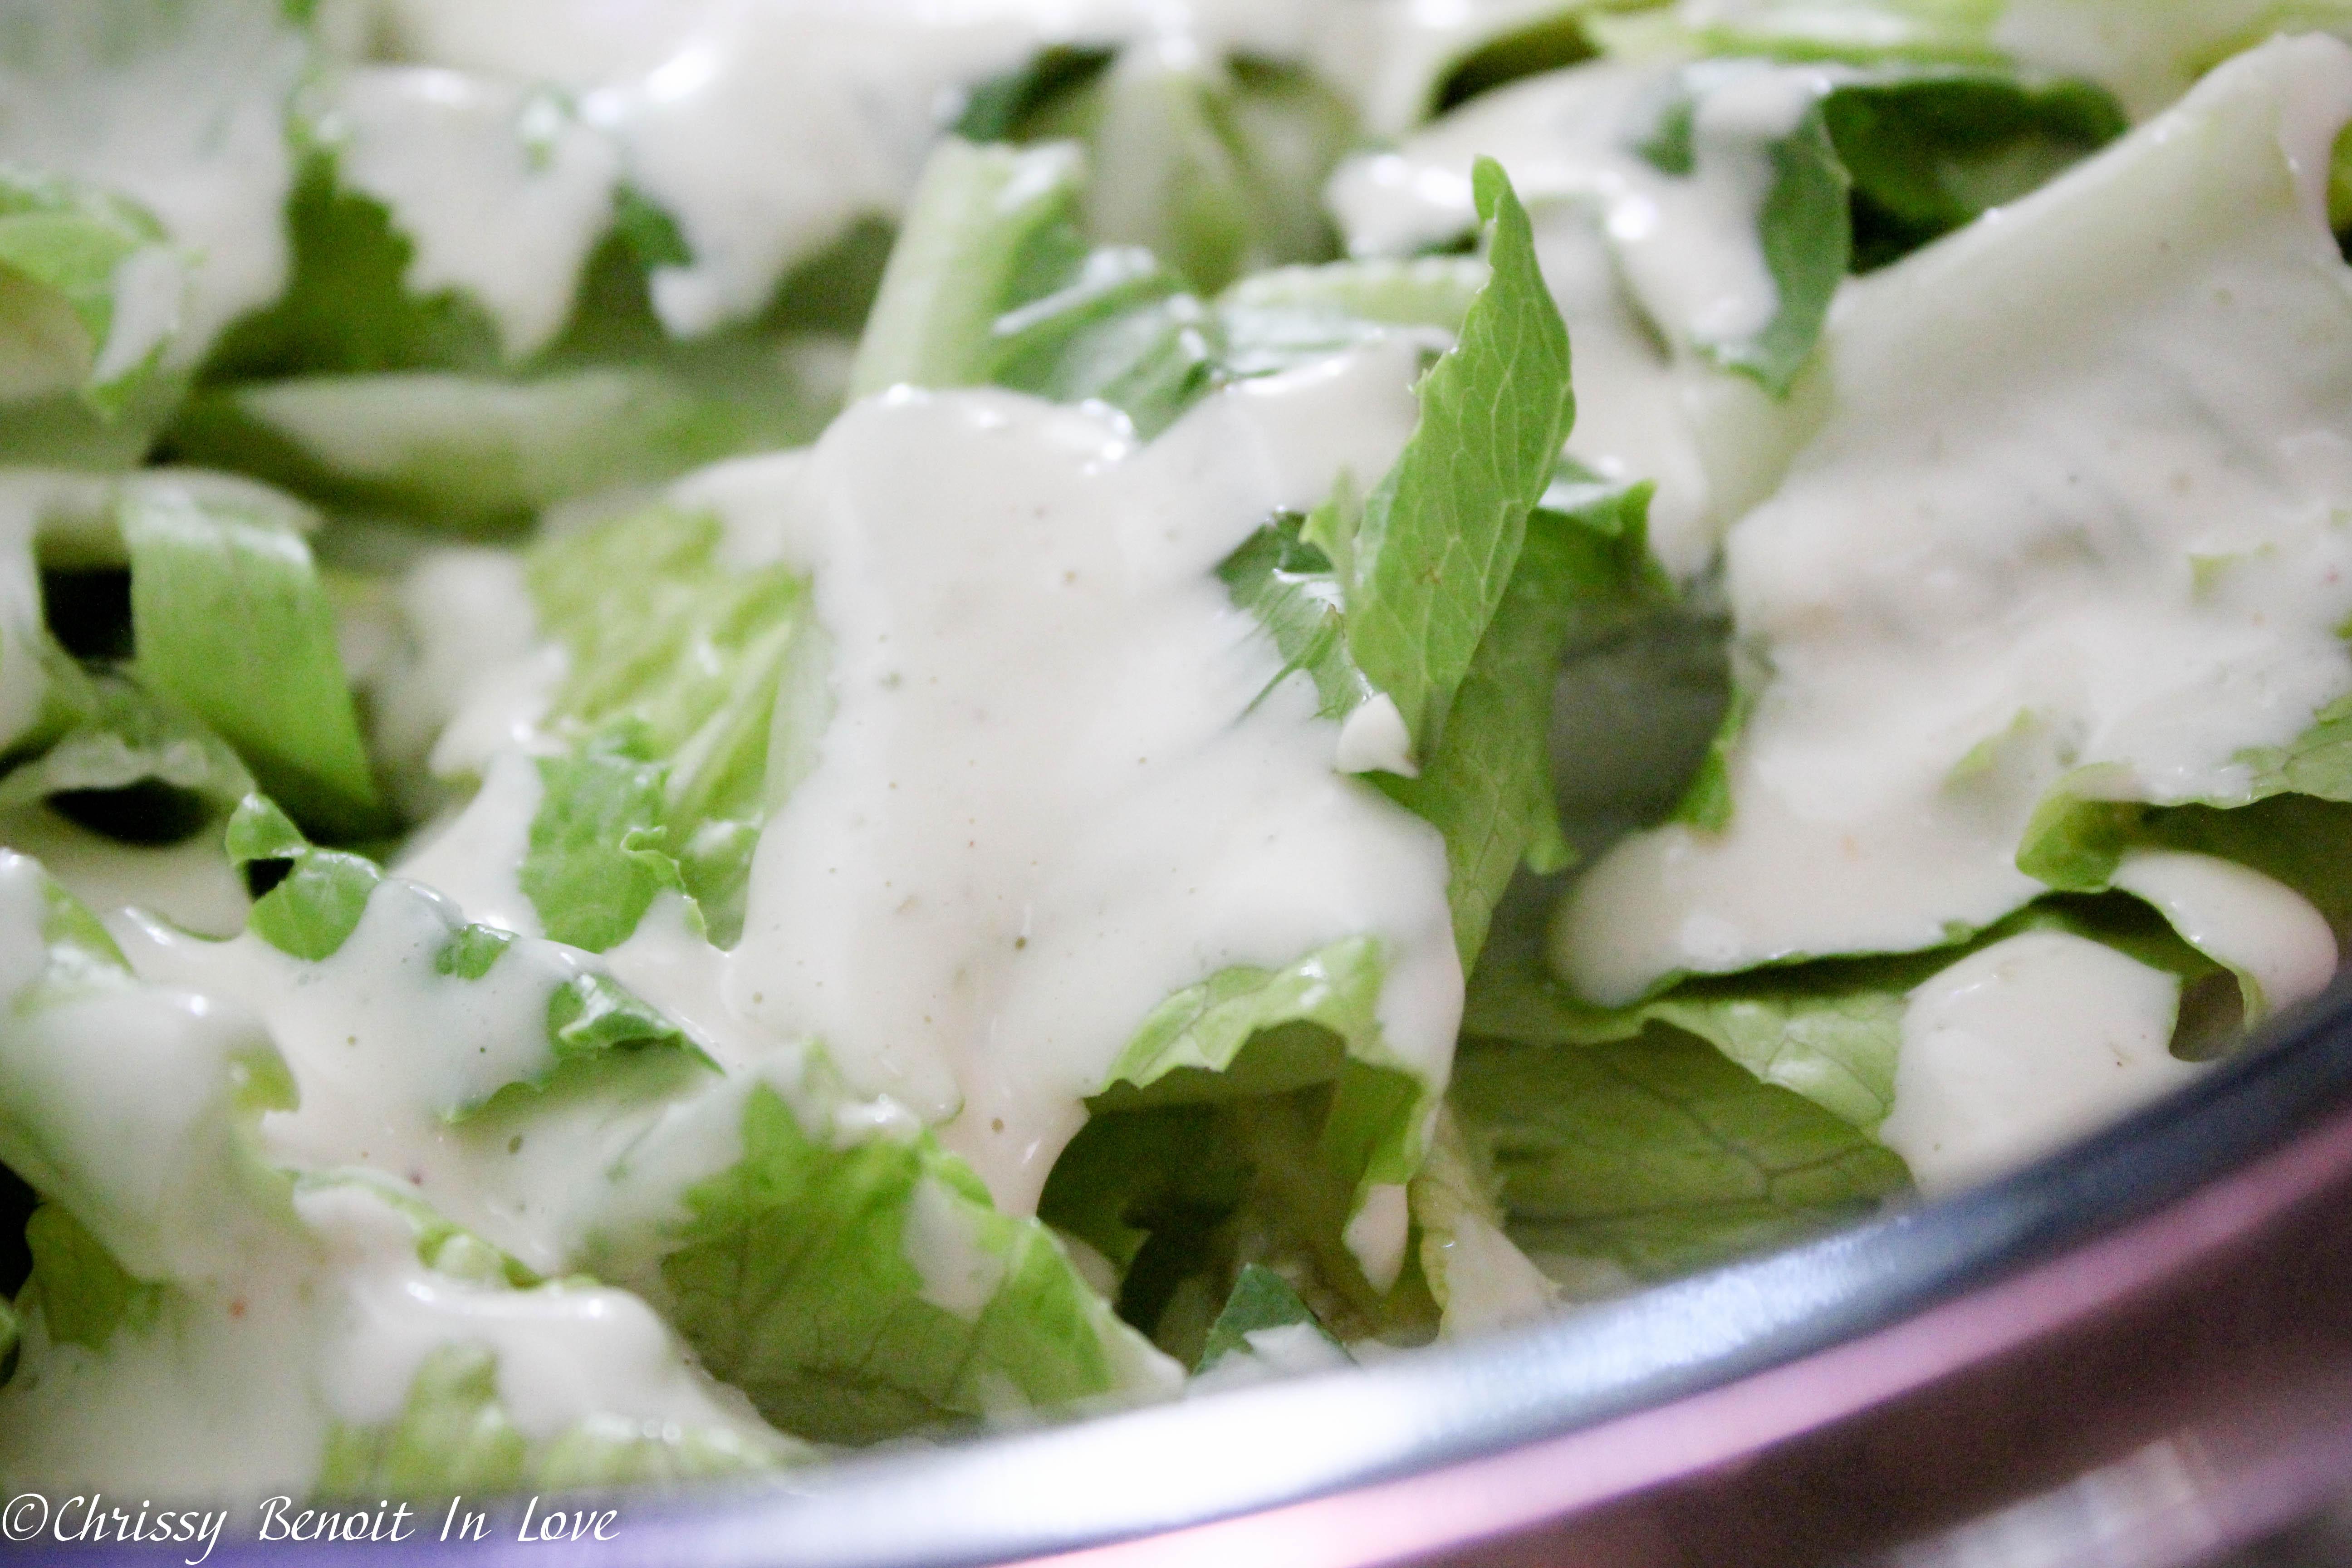 Chrissy's Caesar Salad Dressing/ Dip